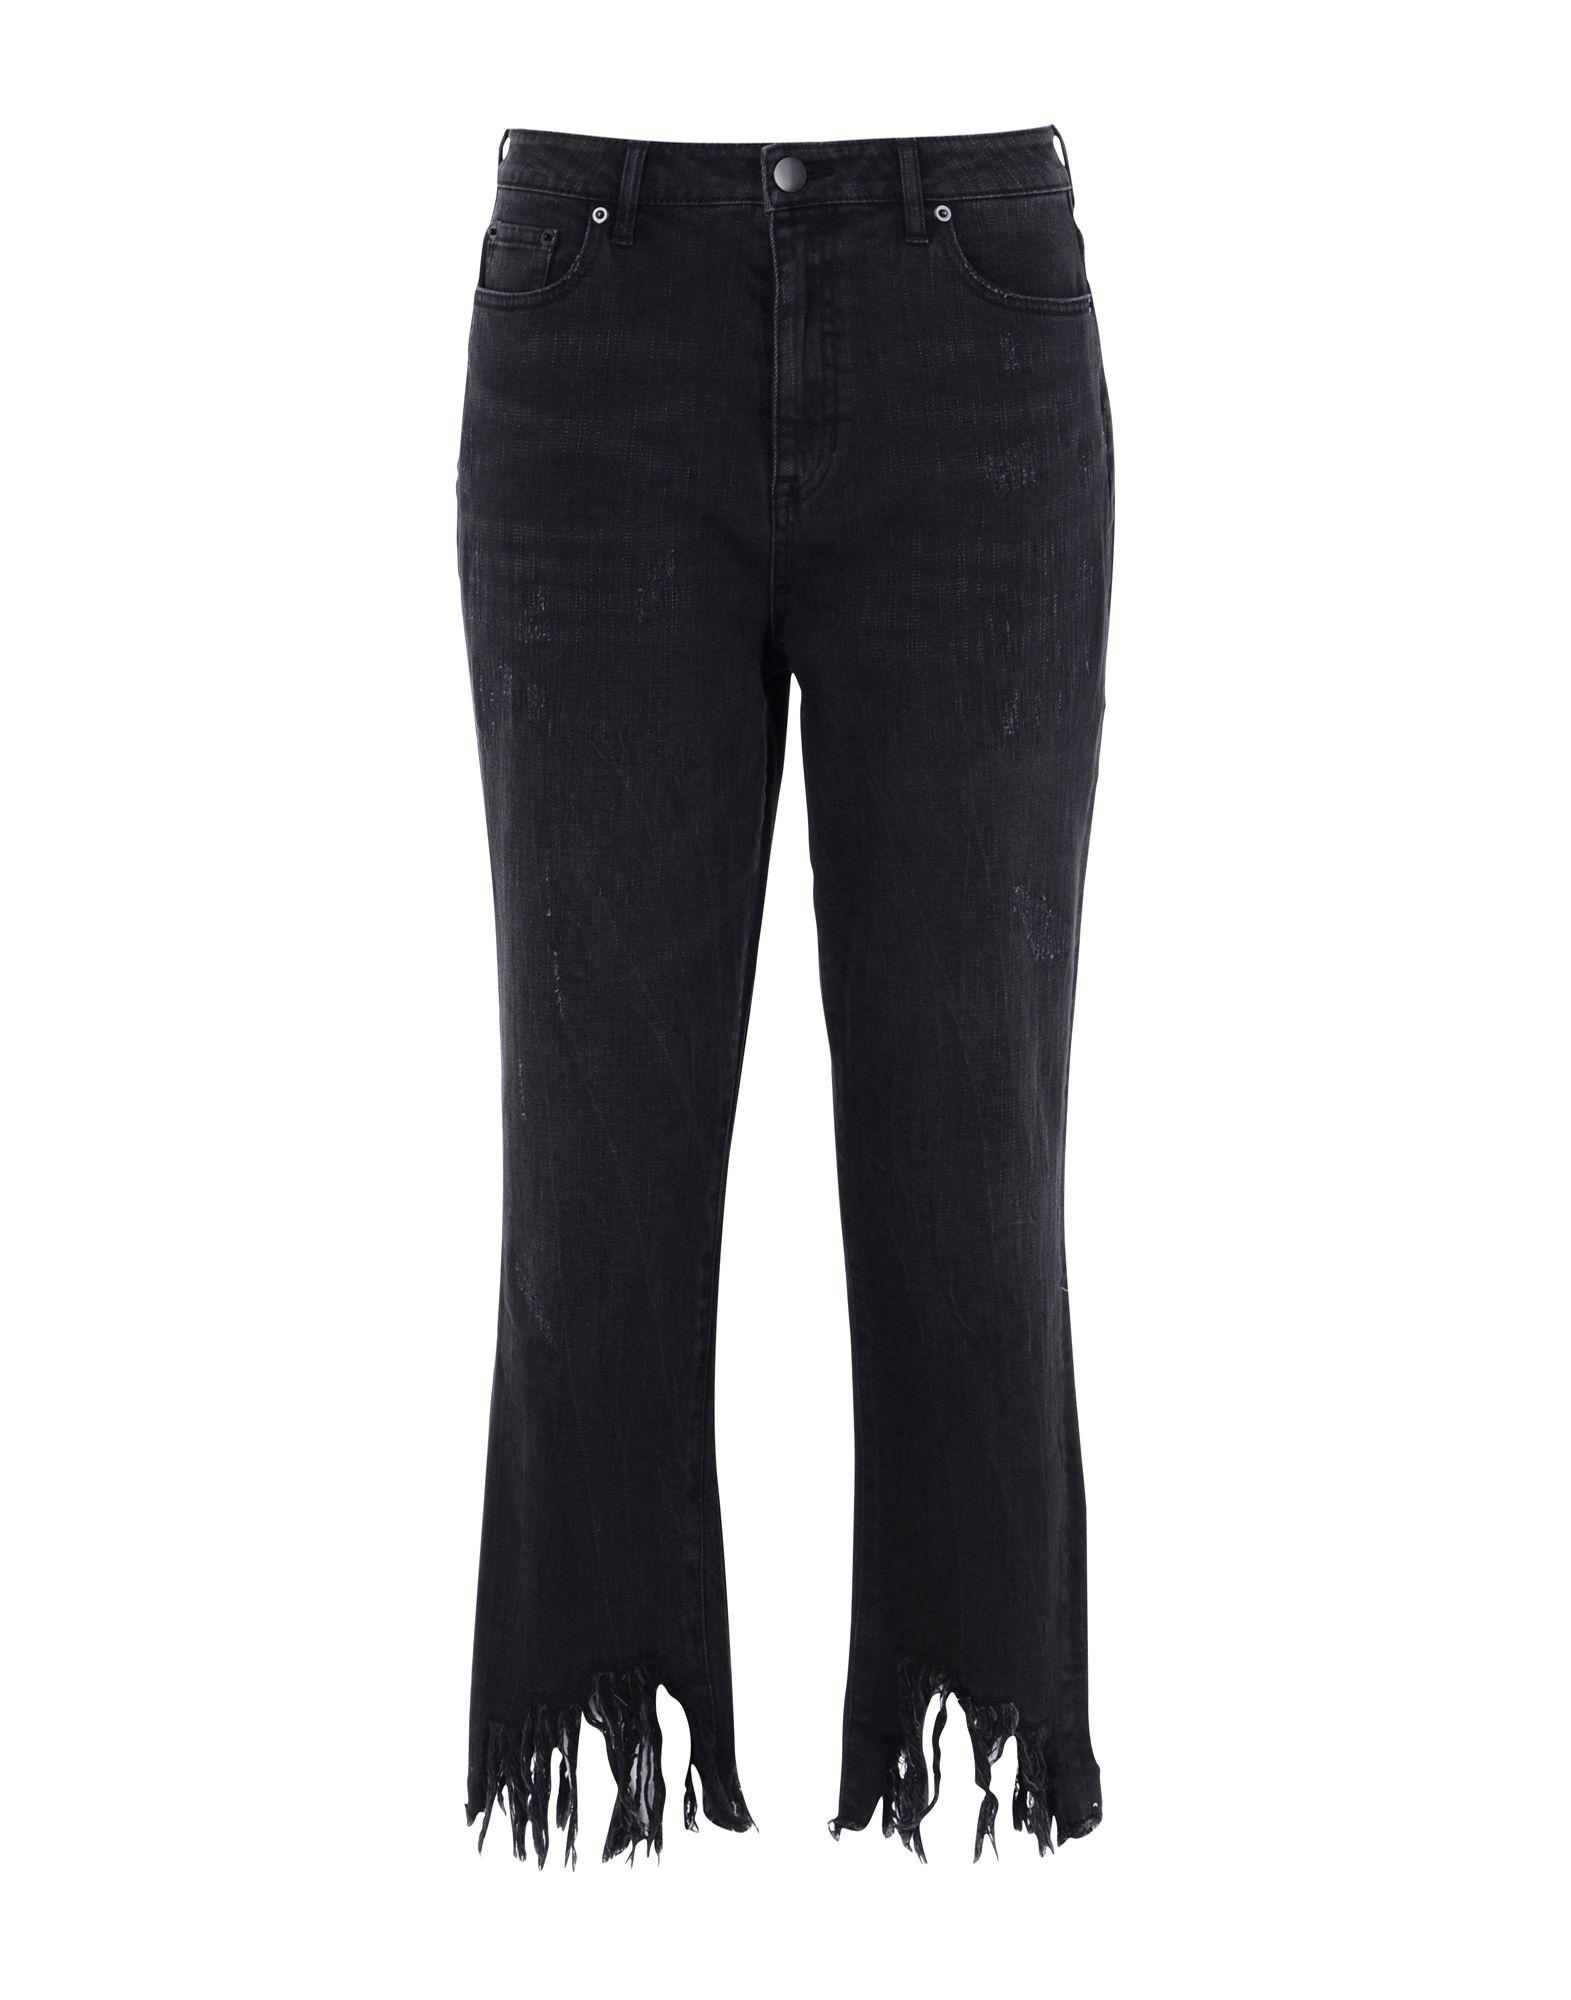 ФОТО george j. love Джинсовые брюки